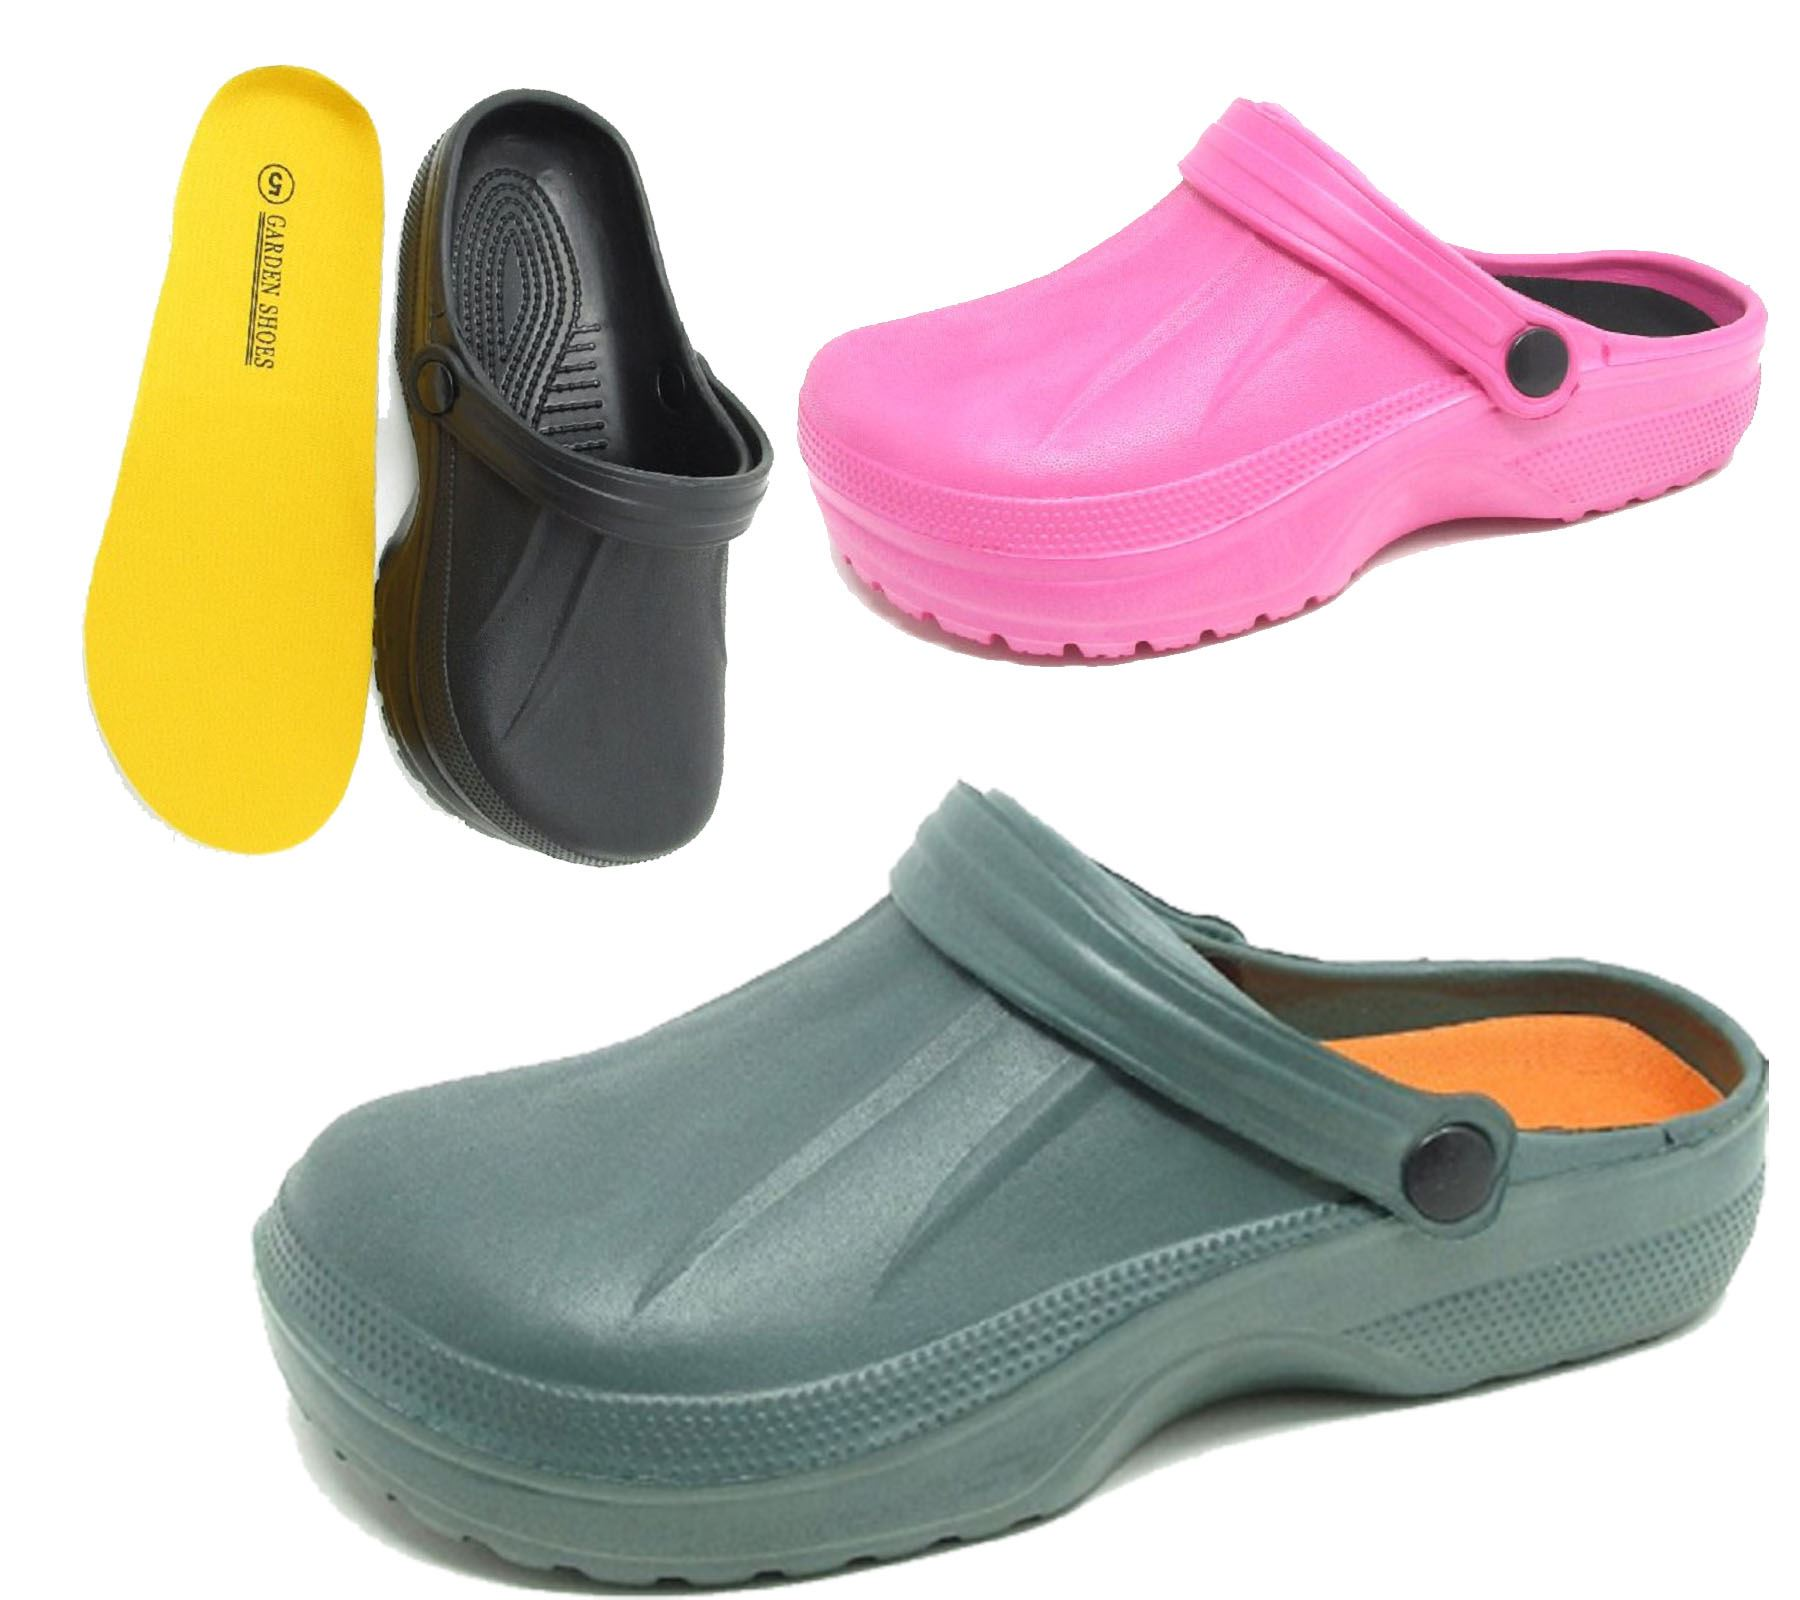 Womens Clogs Mules Slipper Nursing Garden Beach Sandals Hospital ... 9d181fbbdf1